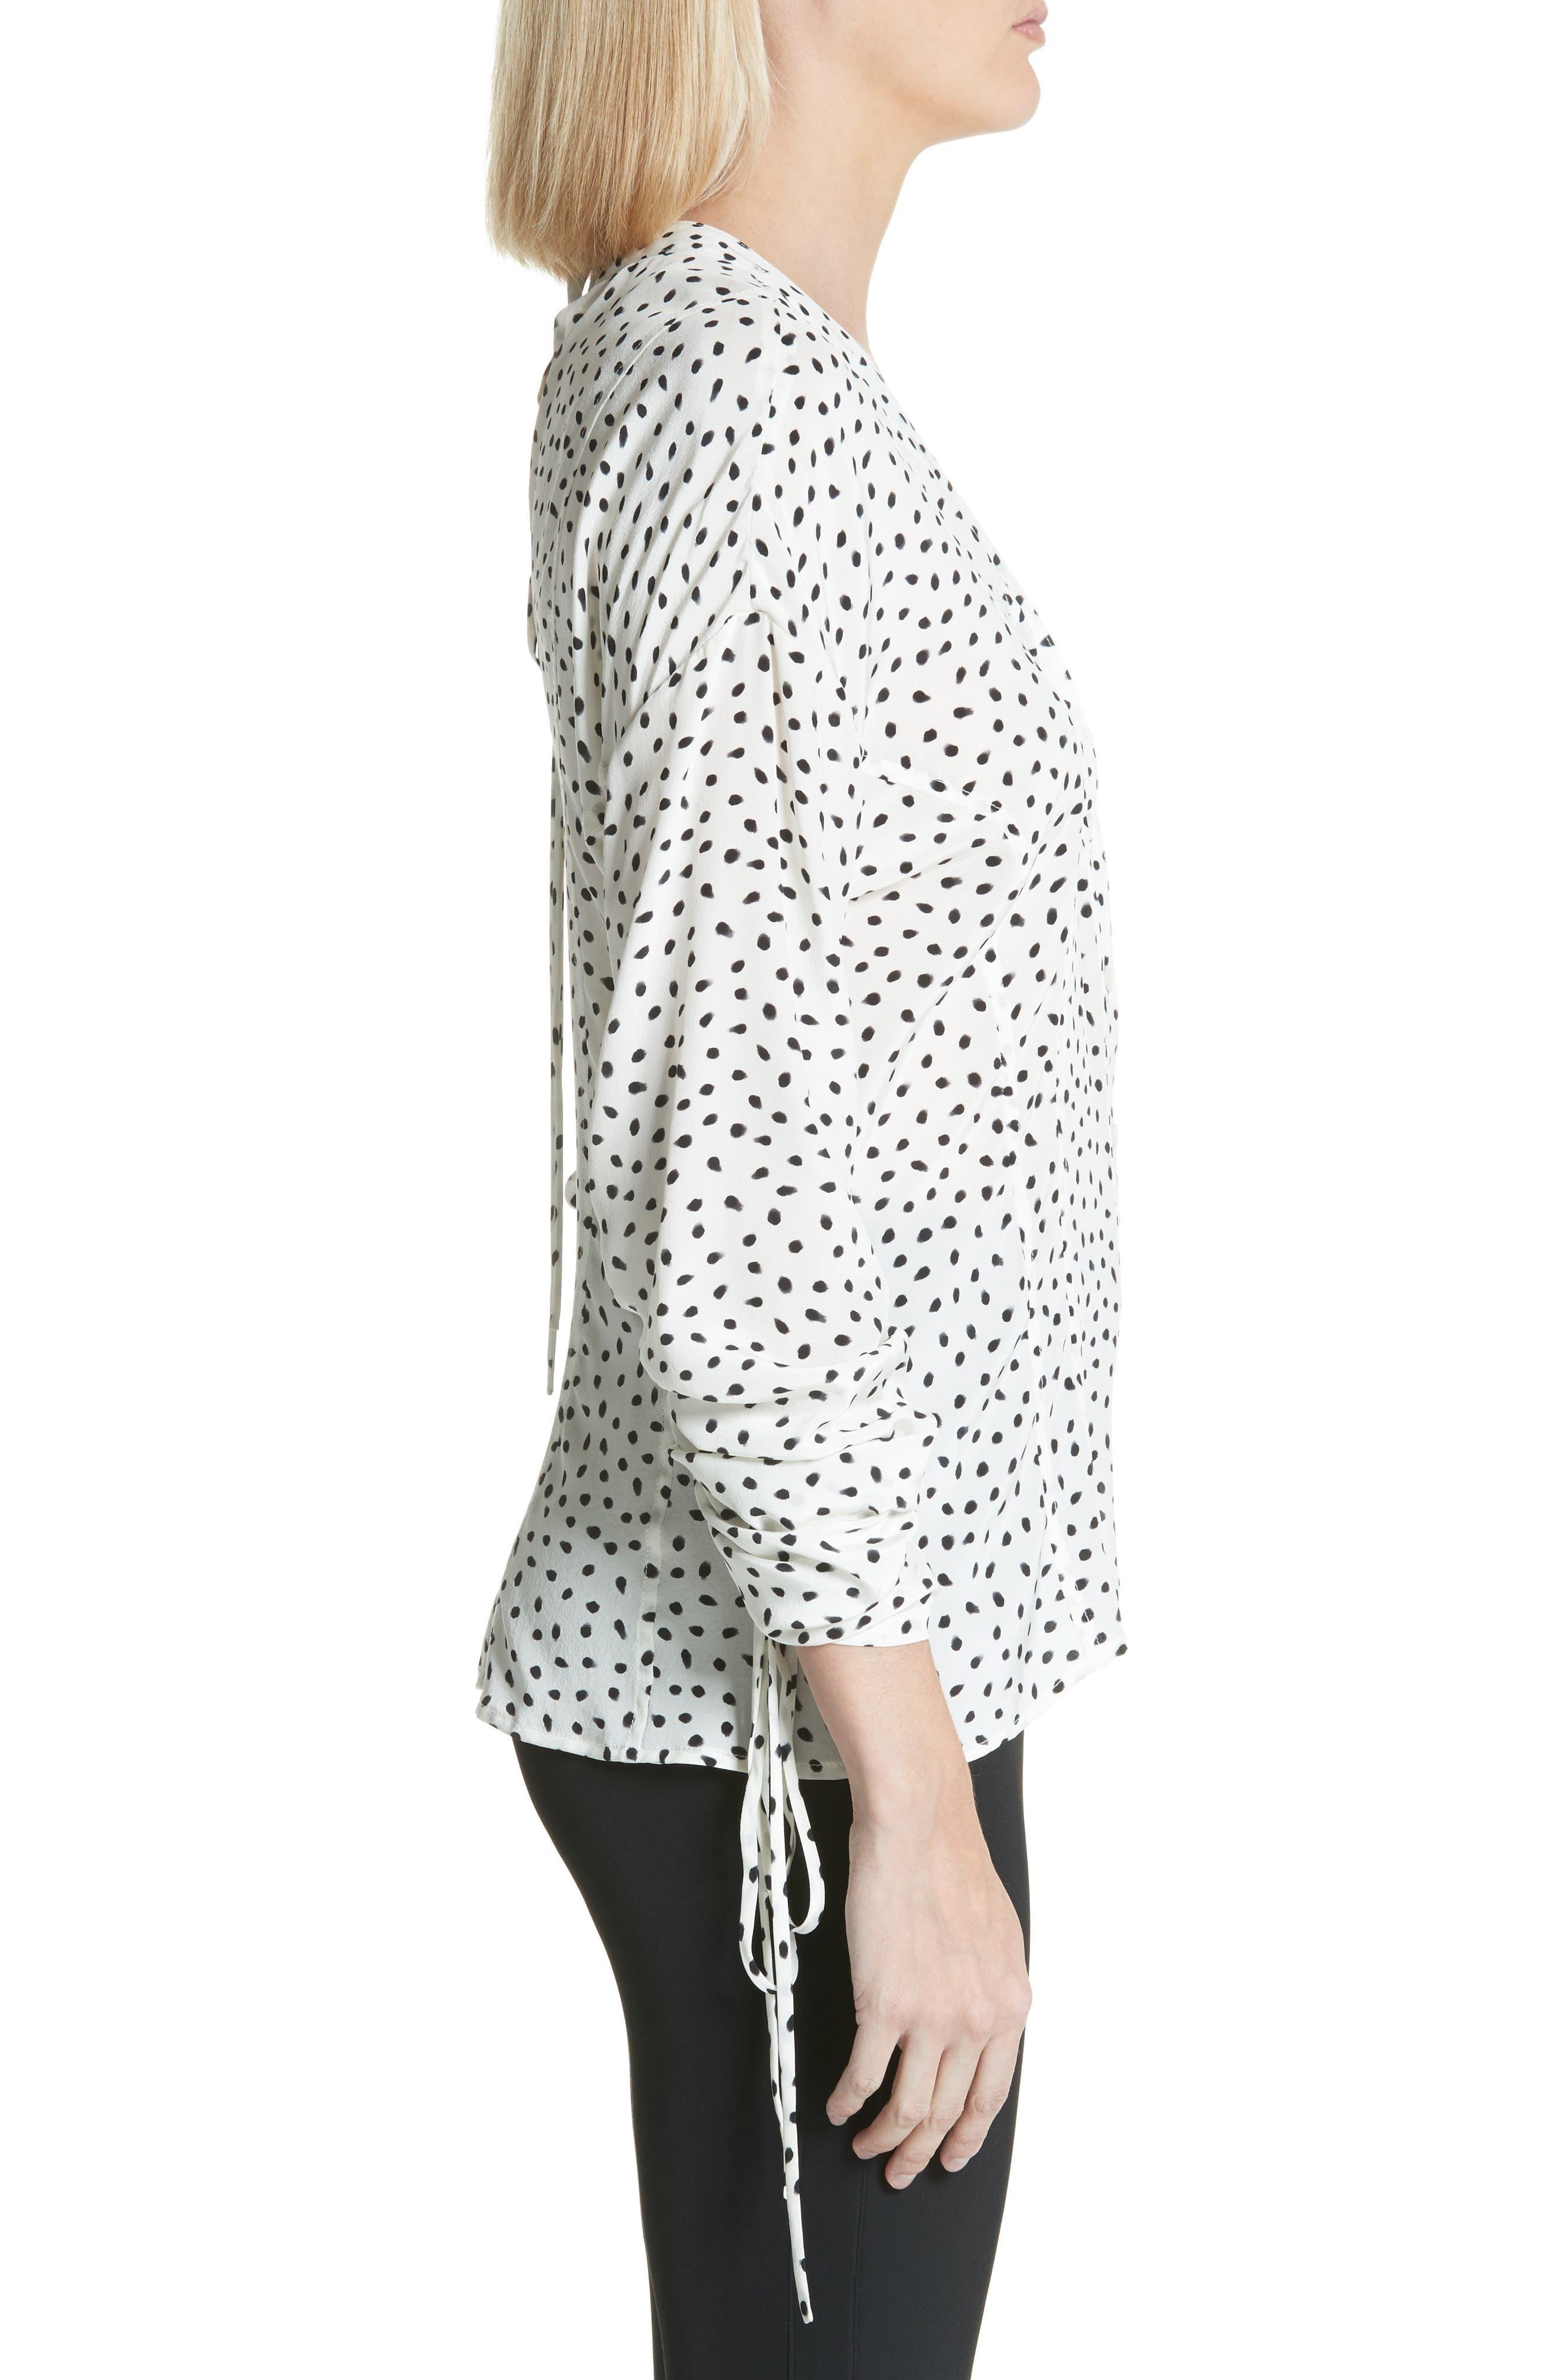 Jason Wu Polka Dot Ruched Sleeve Silk Shirt,                             Alternate thumbnail 3, color,                             903